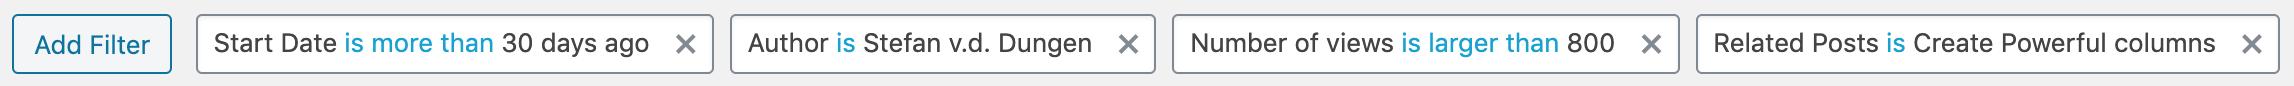 metabox smart filtering